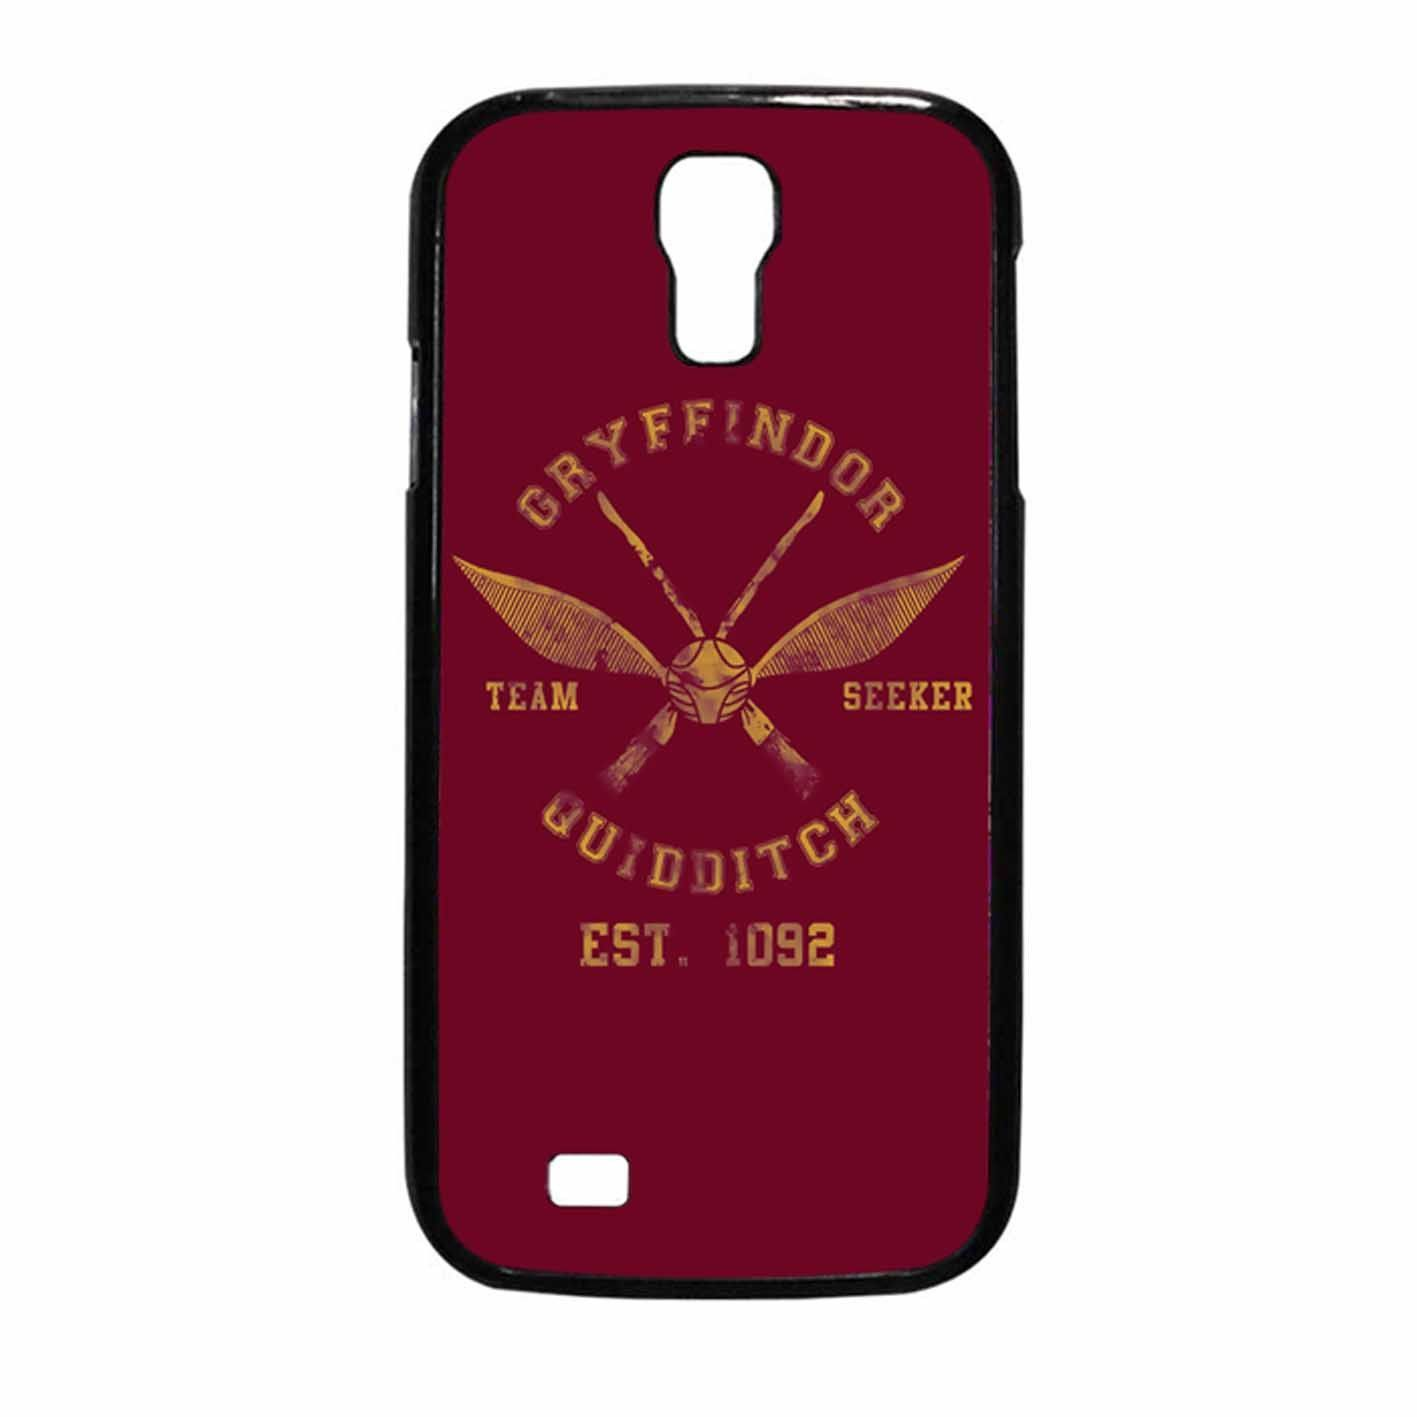 Top Wallpaper Harry Potter Galaxy S6 - ca8b0f8c0d60dbb0058596764a24229b  Perfect Image Reference_394124.jpg